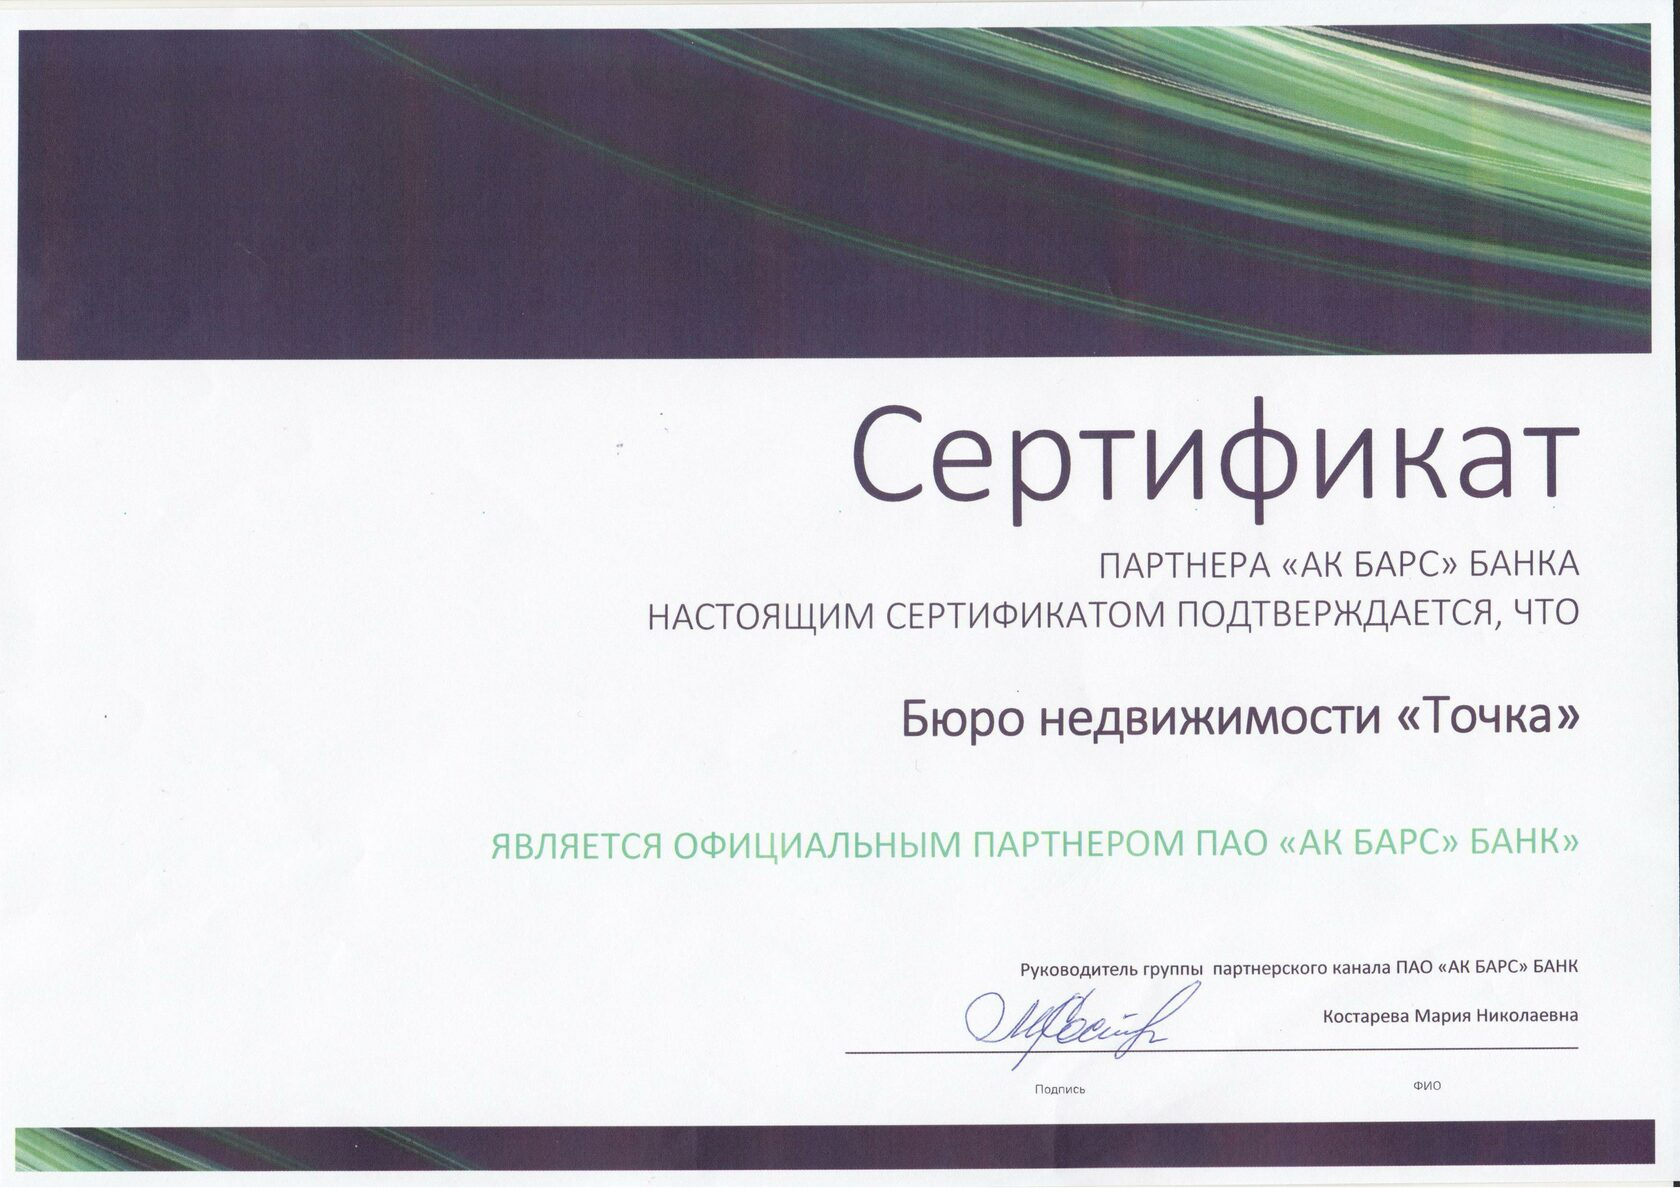 Бюро недвижимости ТОЧКА и Ак Барс Банк